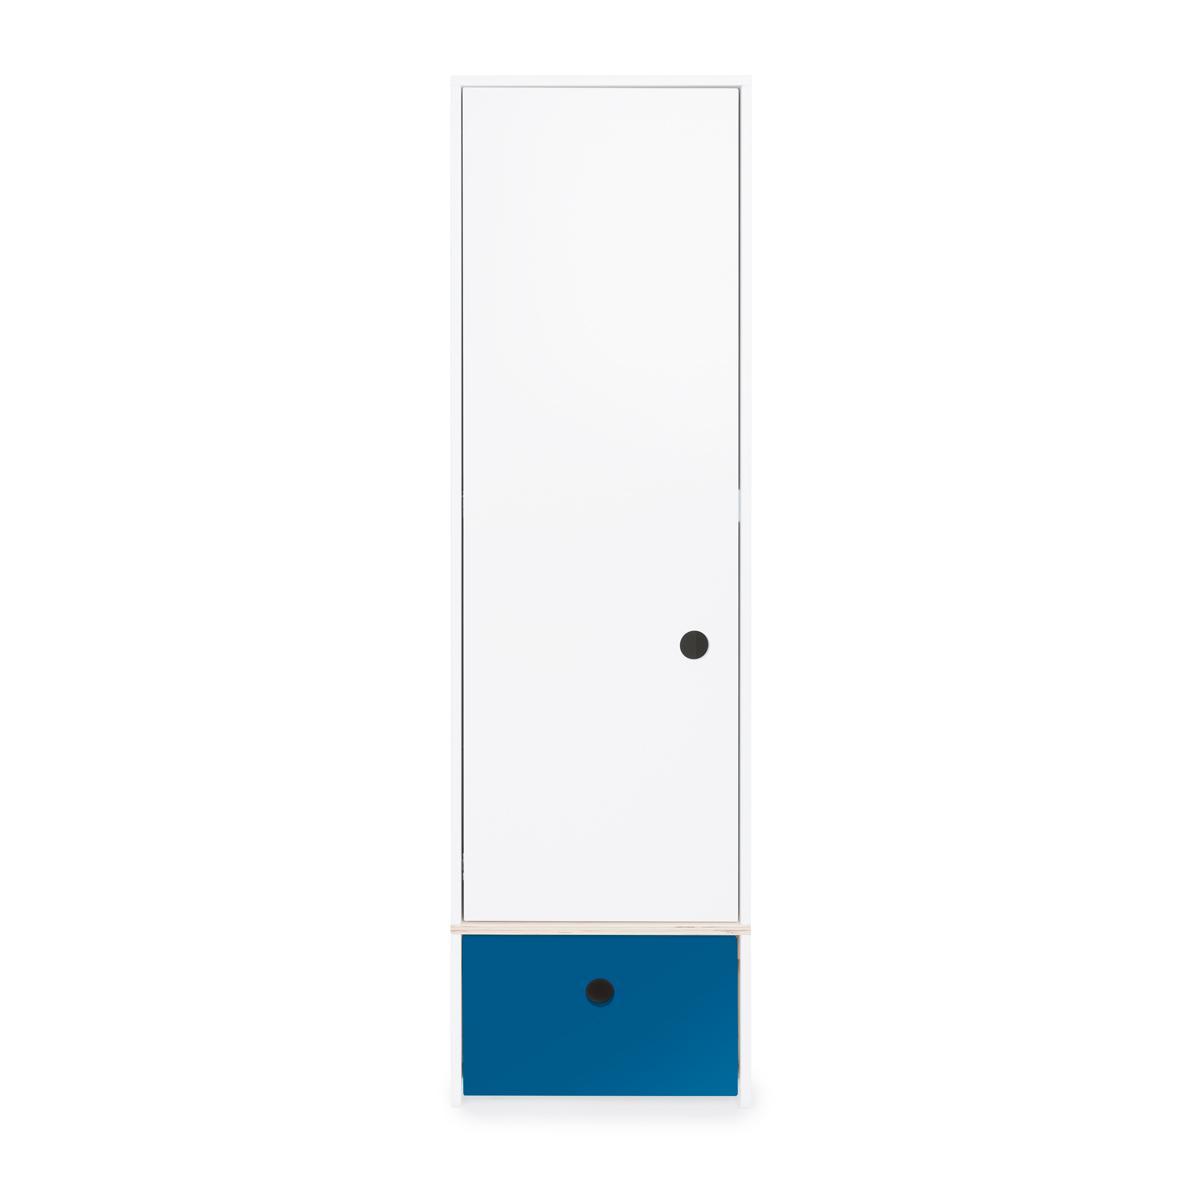 Armoire 1 porte façade tiroir bleu marine